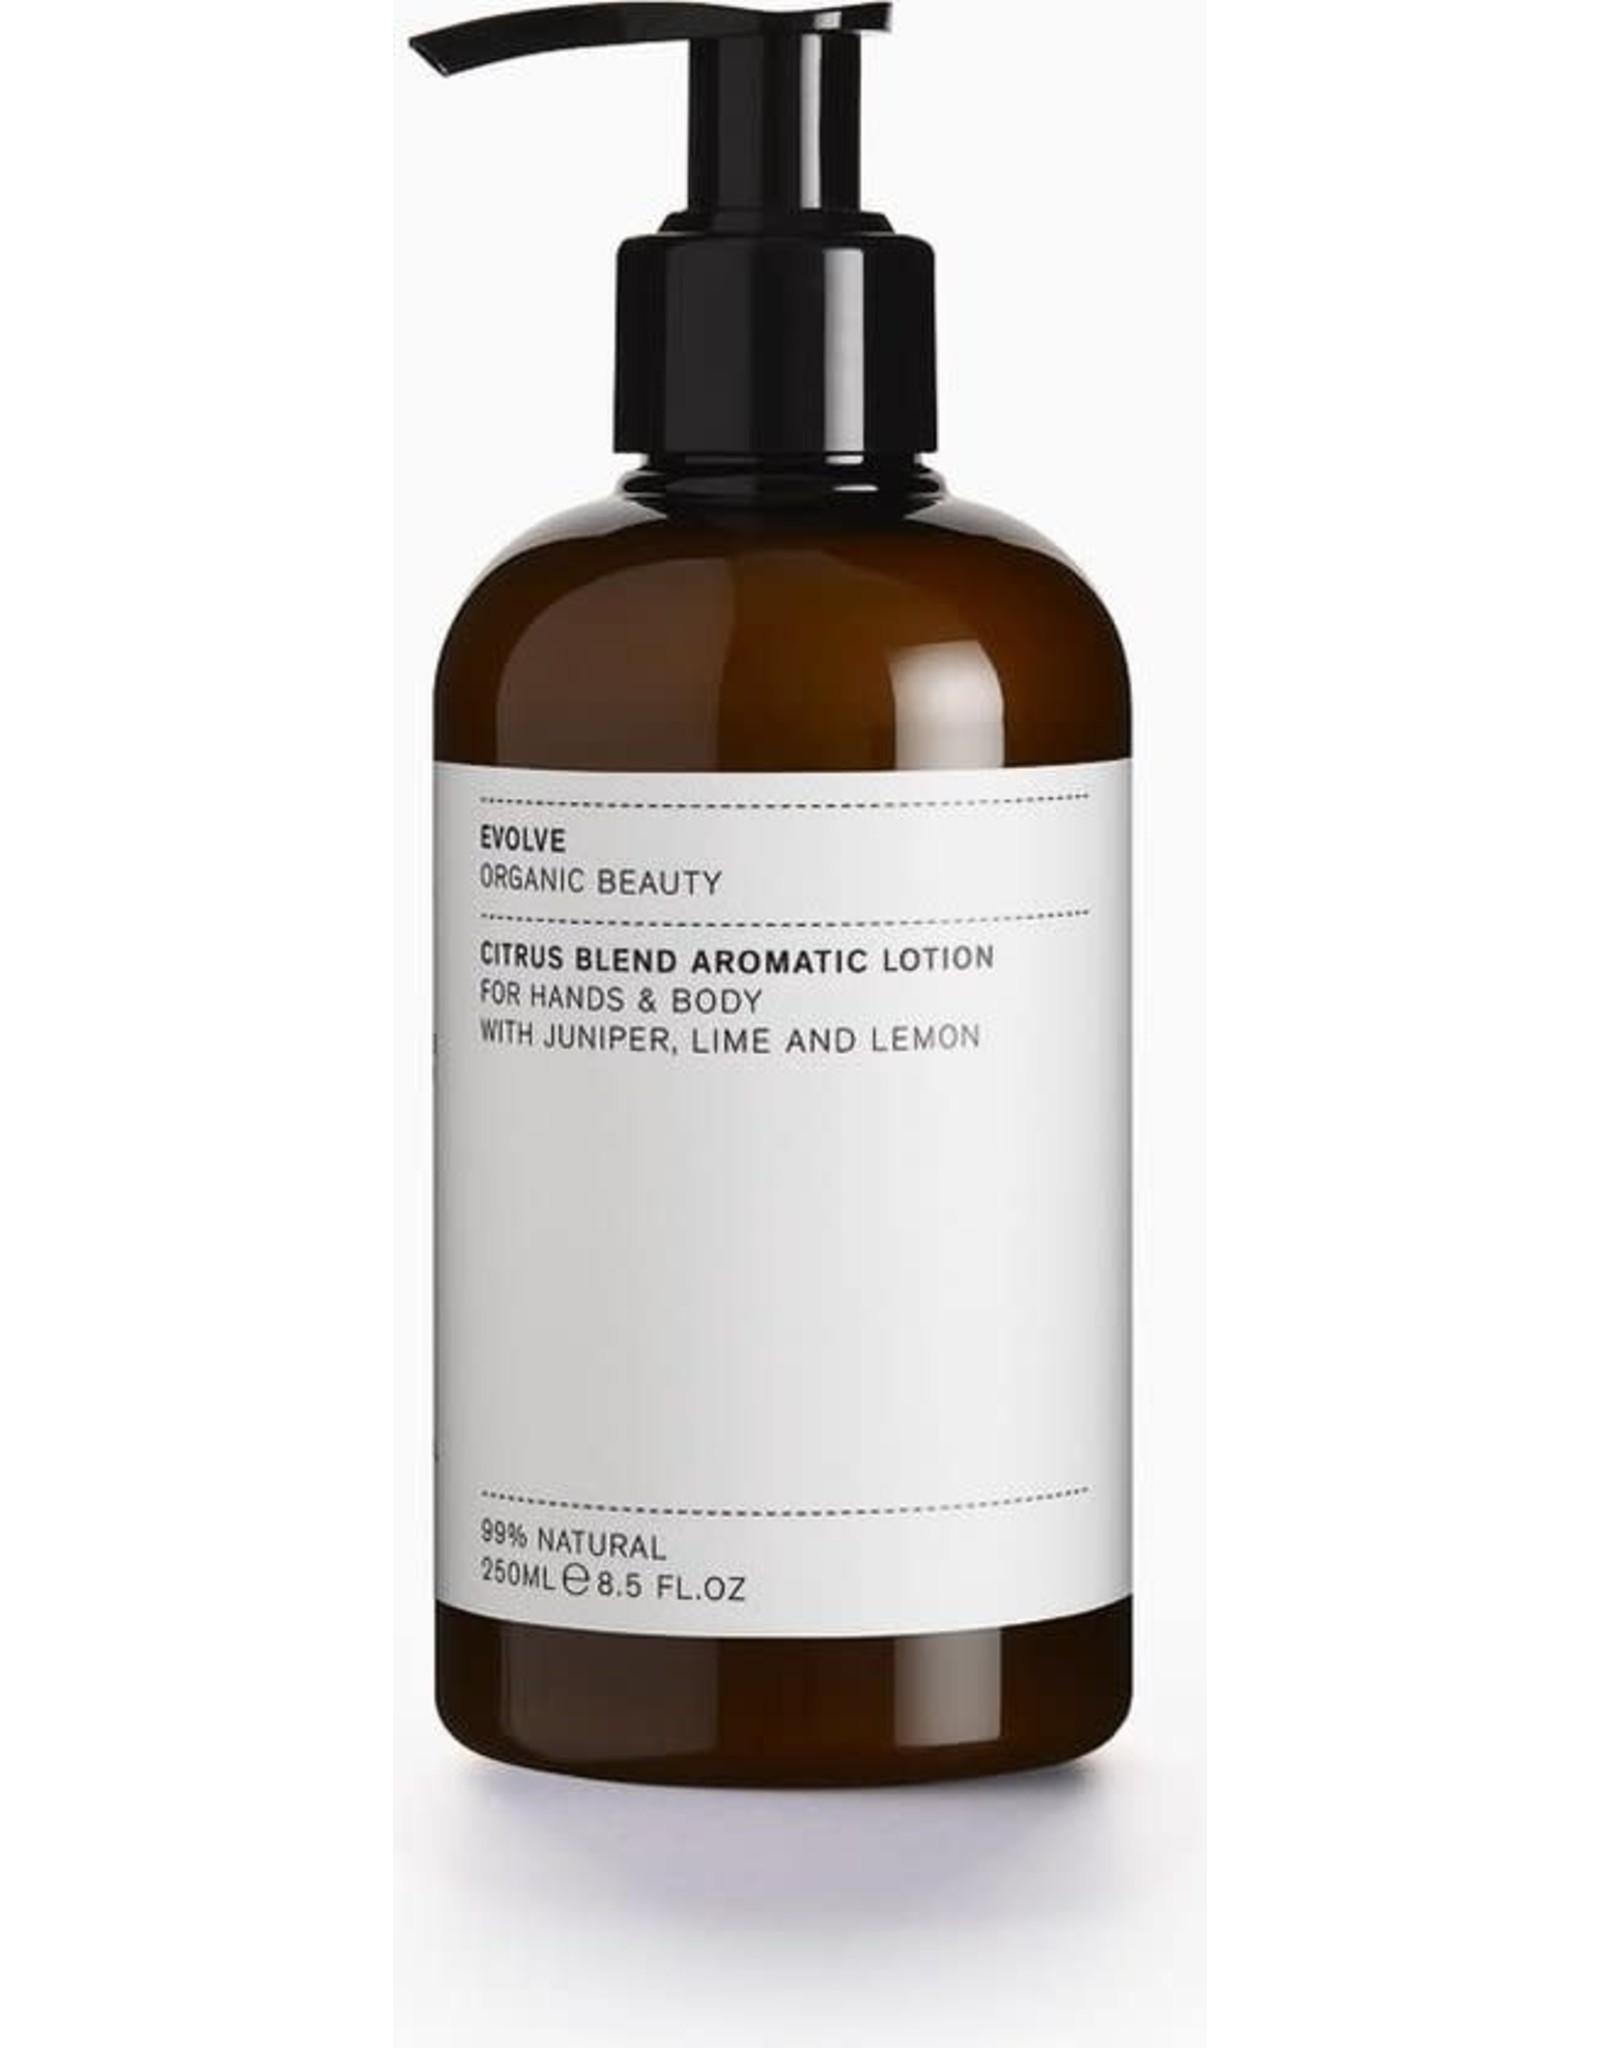 Evolve Citrus blend aromatic lotion 500ml